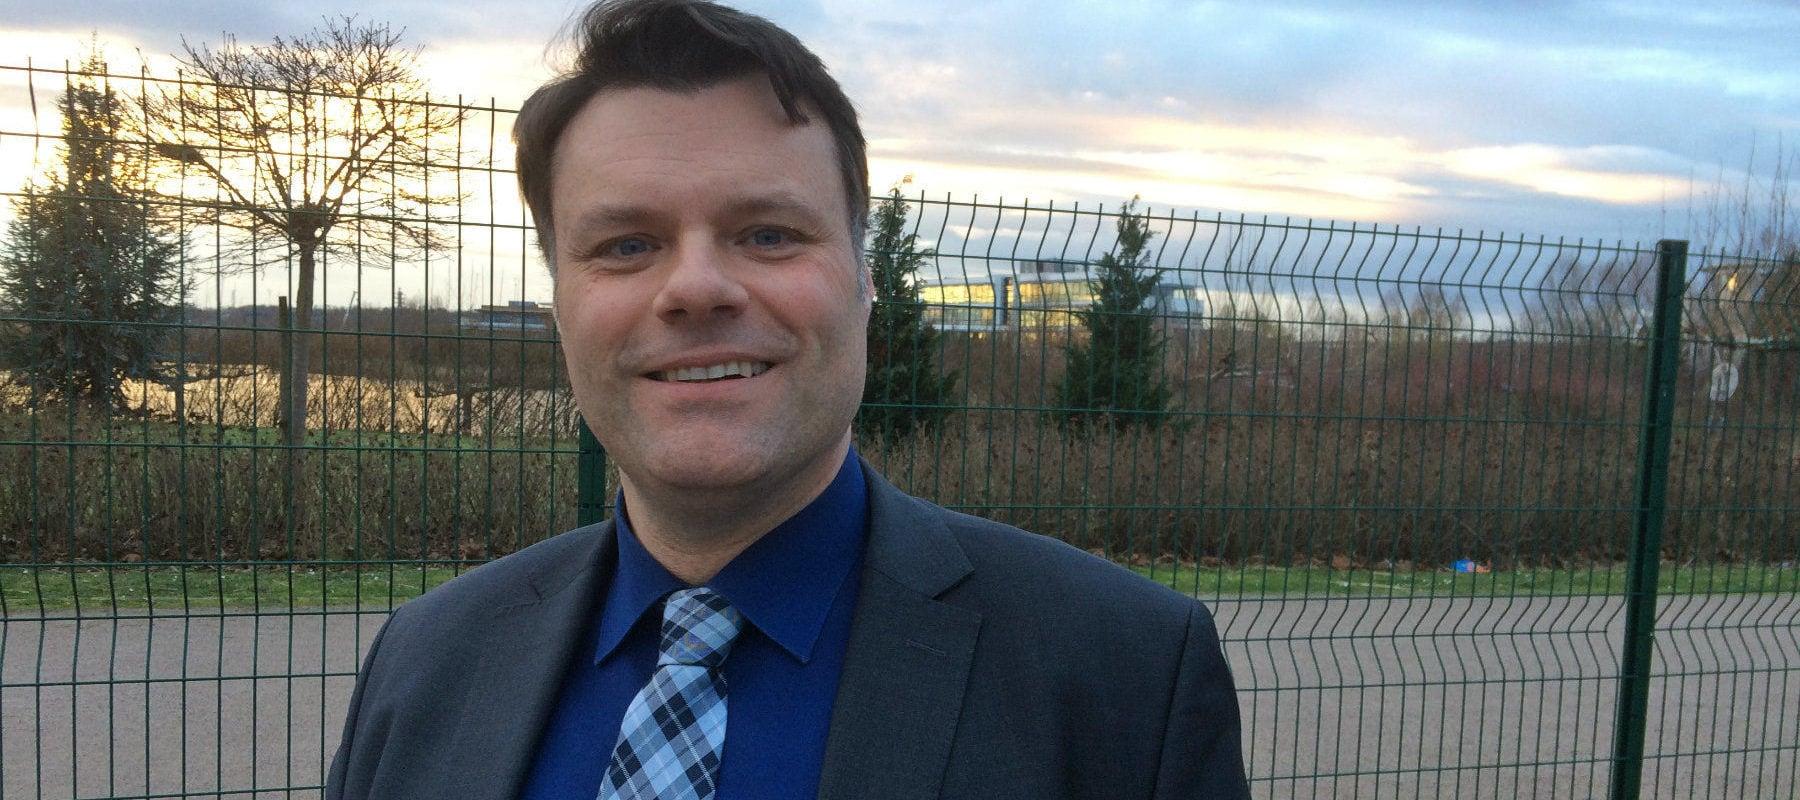 Municipales à Schiltigheim : la droite redonne sa chance à Christian Ball